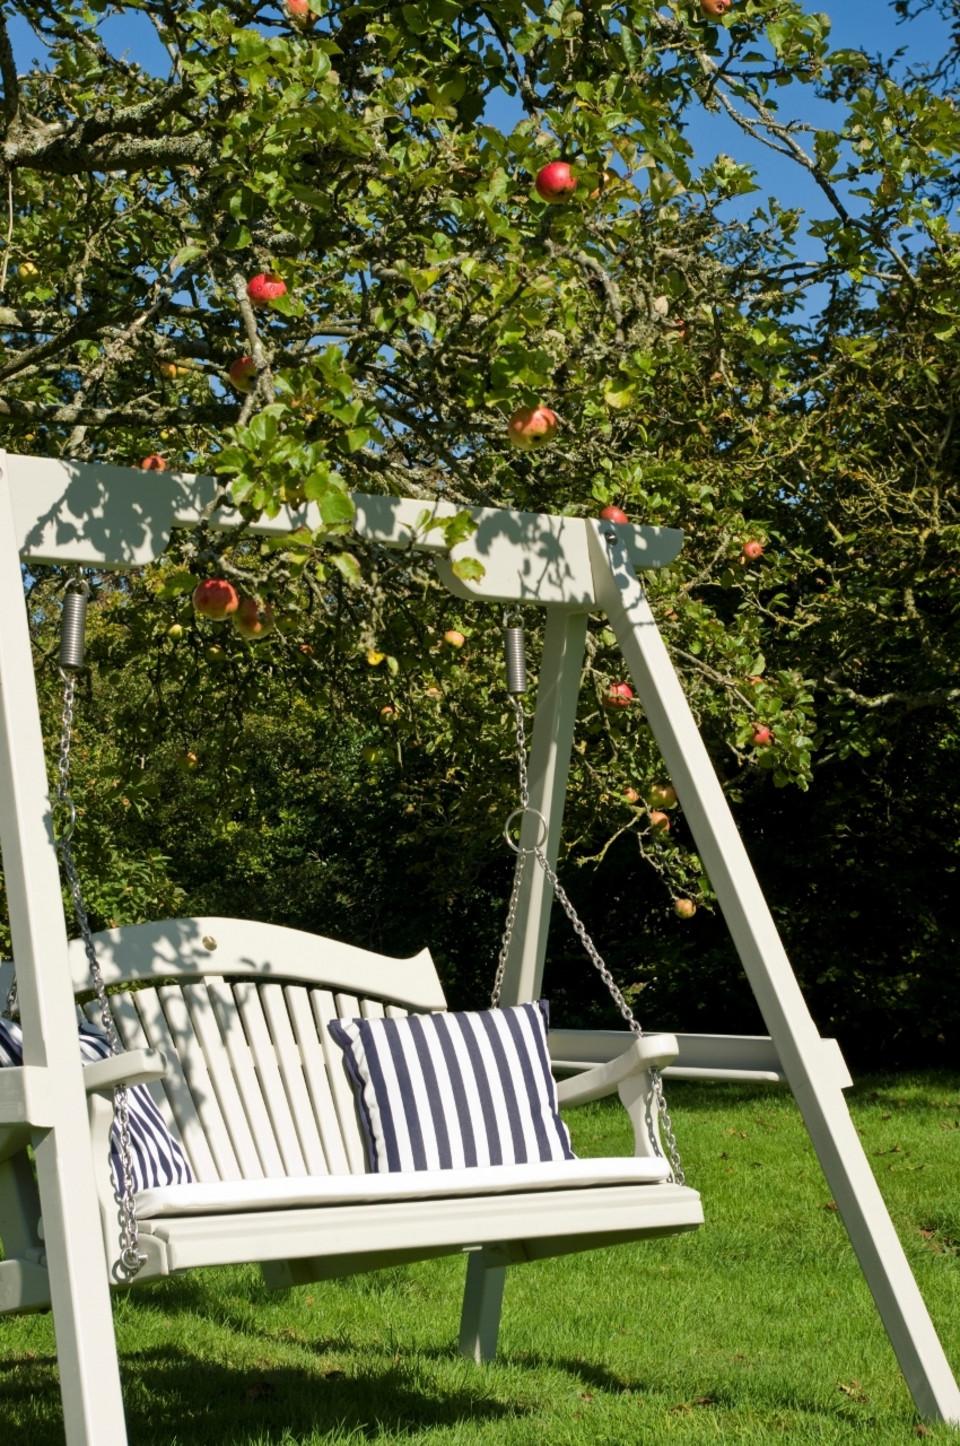 Garden Swing Seat The Harmony Range In Pine Buy Now